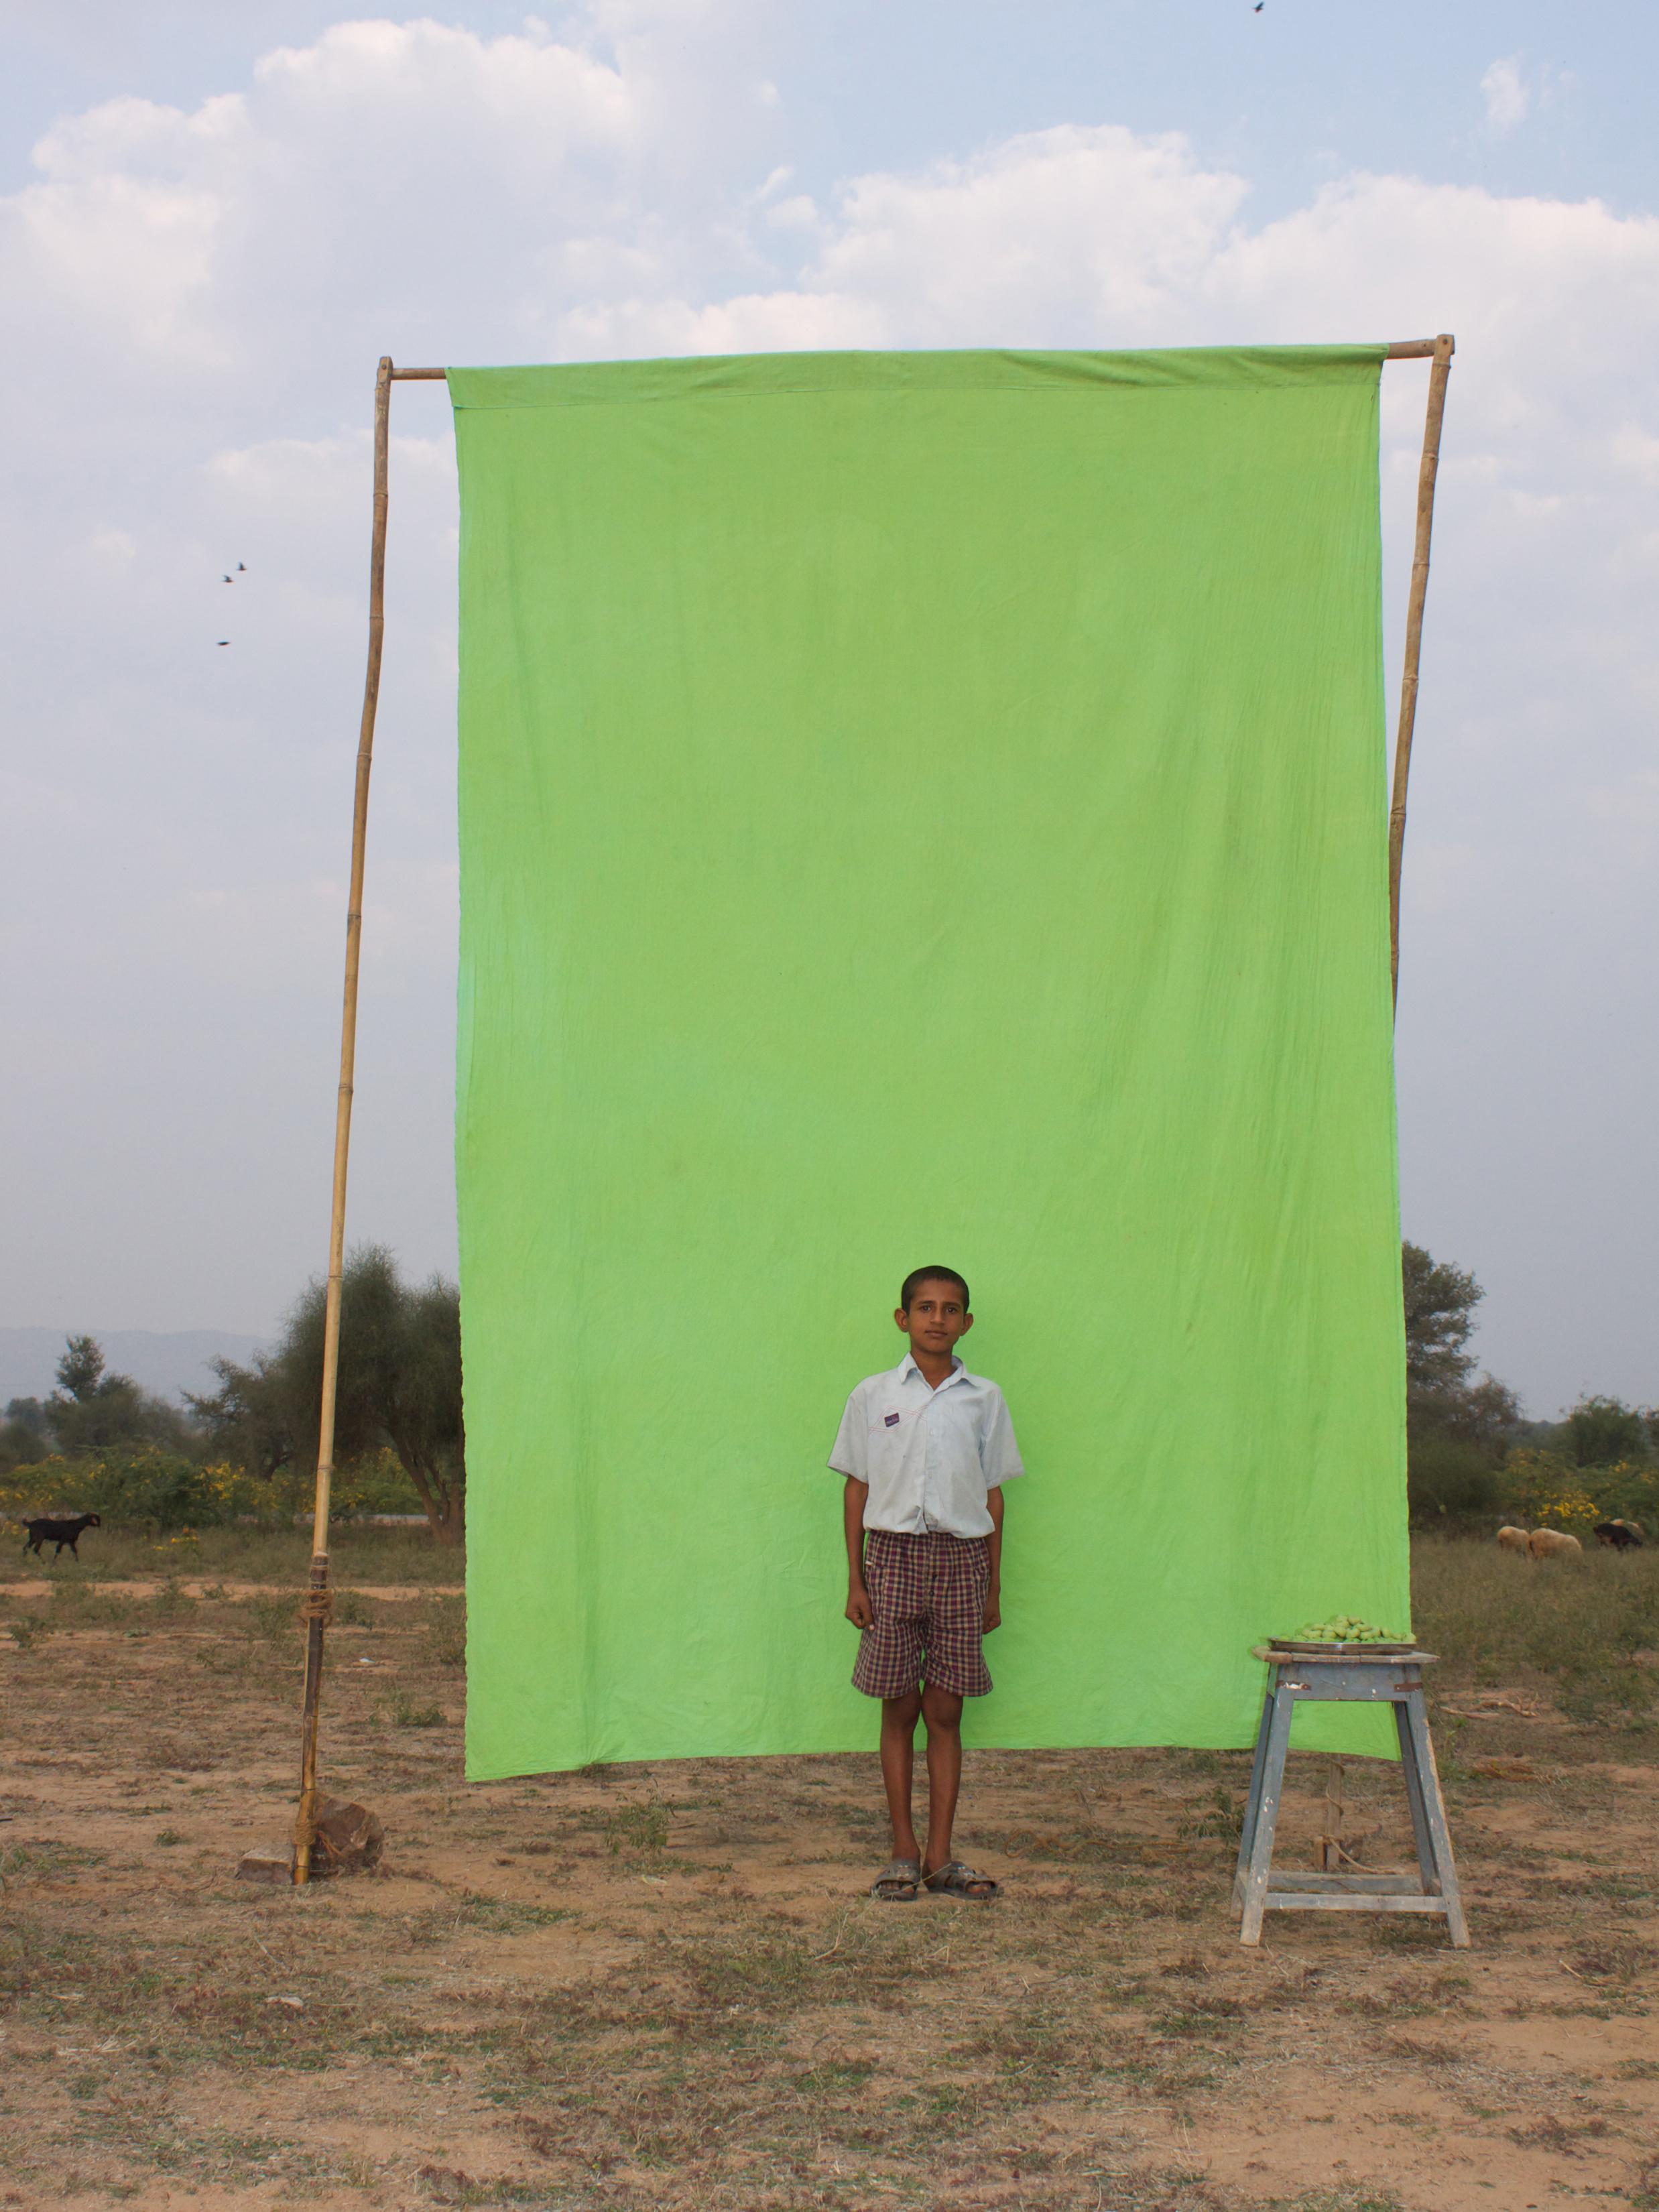 Benjamin Faga   Chroma Green No. 13      C-print    30 x 40 inches